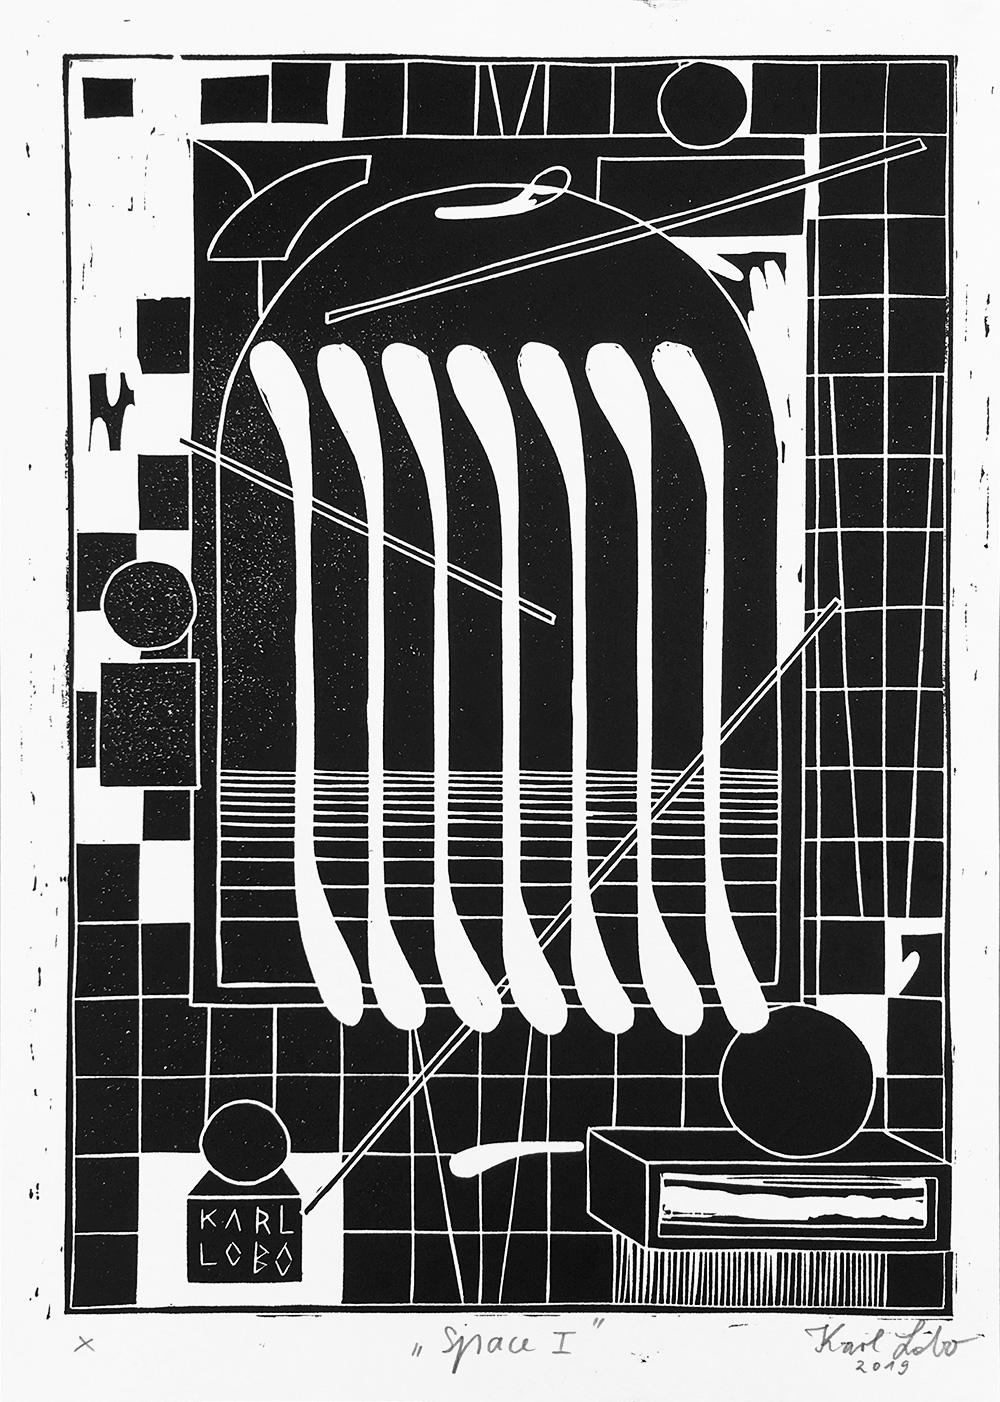 Karl Lobo – Human Space